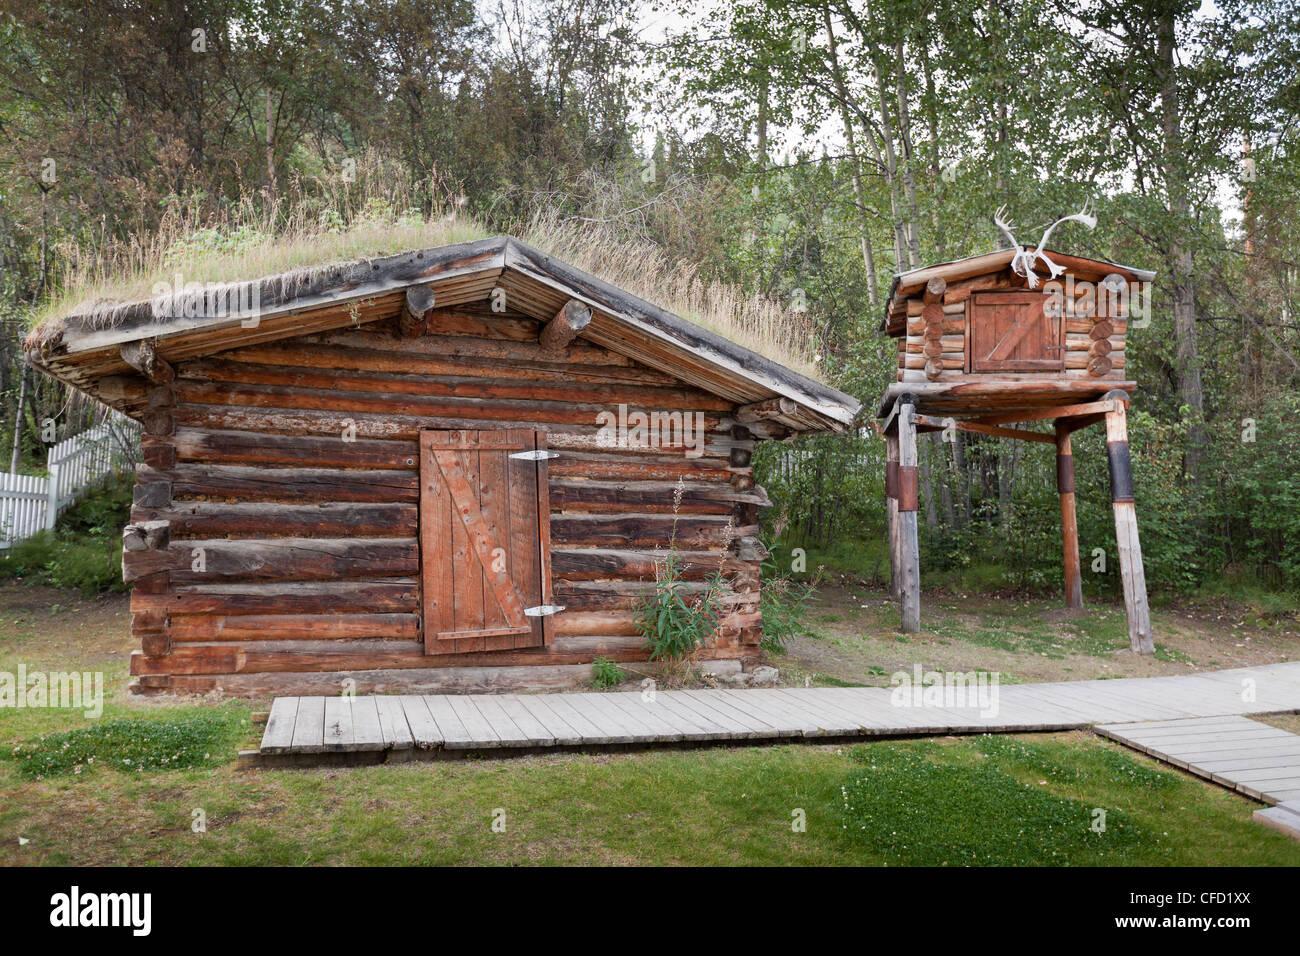 Jack London's cabin in Dawson City, Yukon, Canada - Stock Image